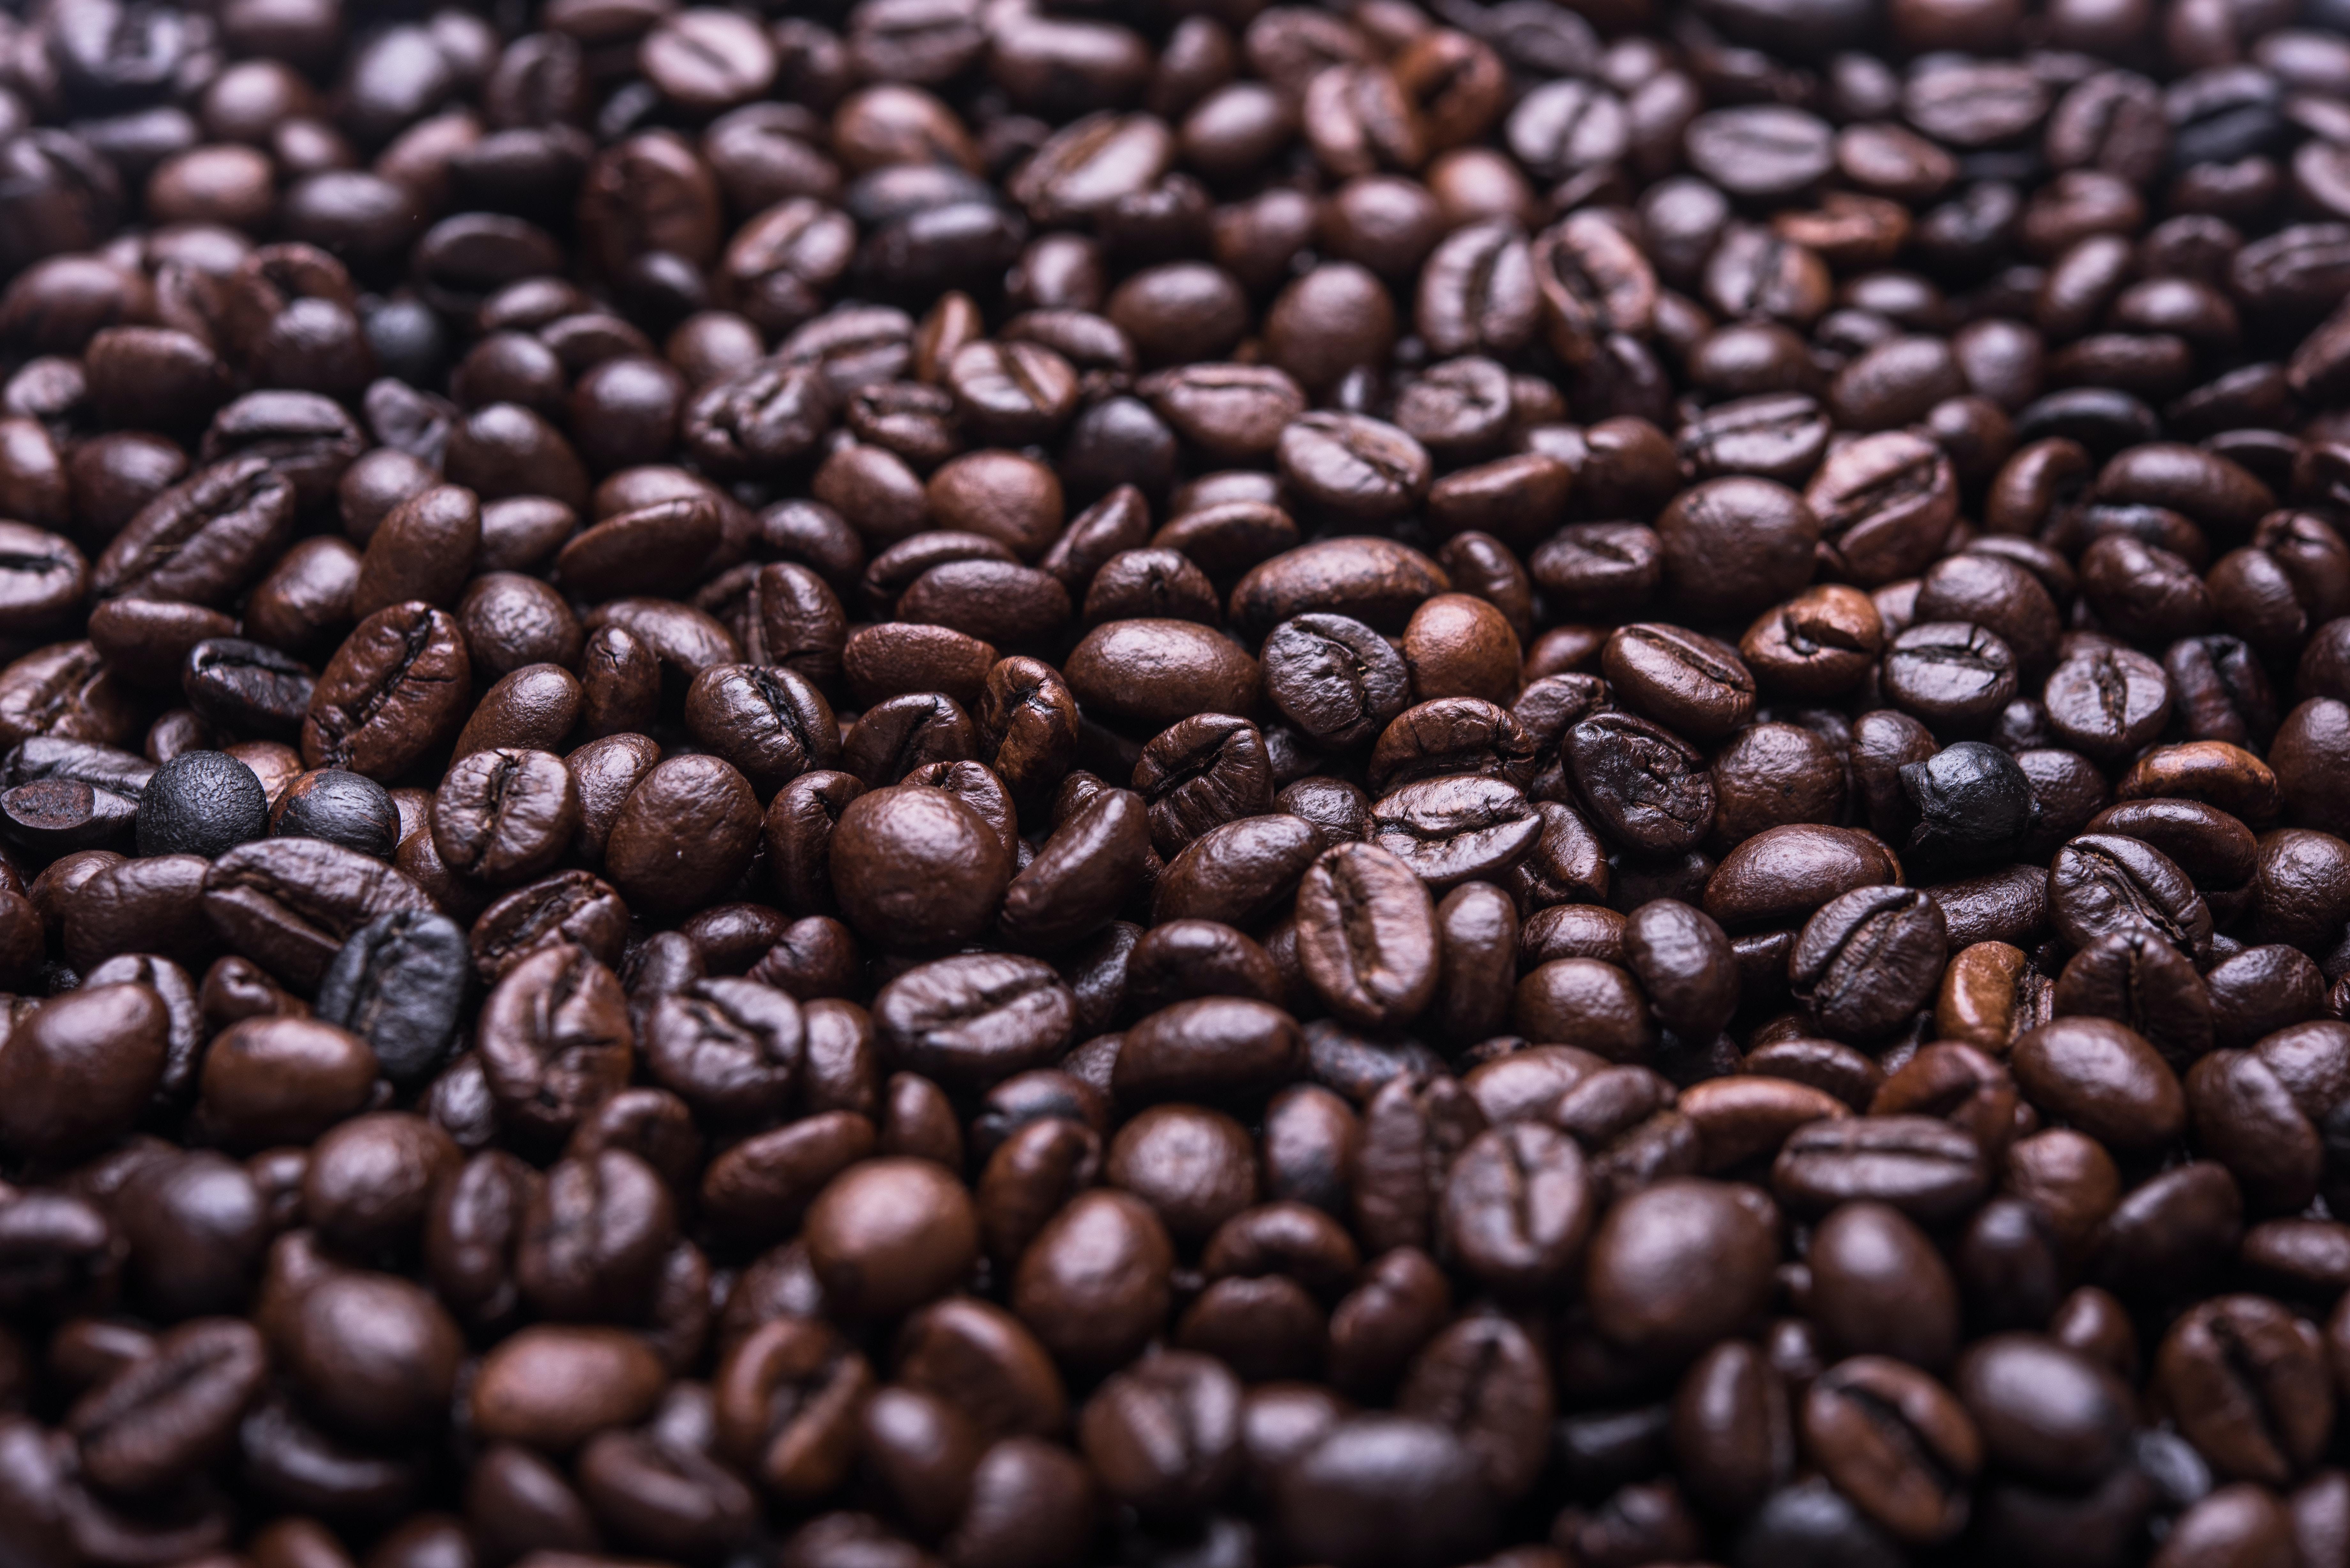 Macro view of fresh natural coffee beans